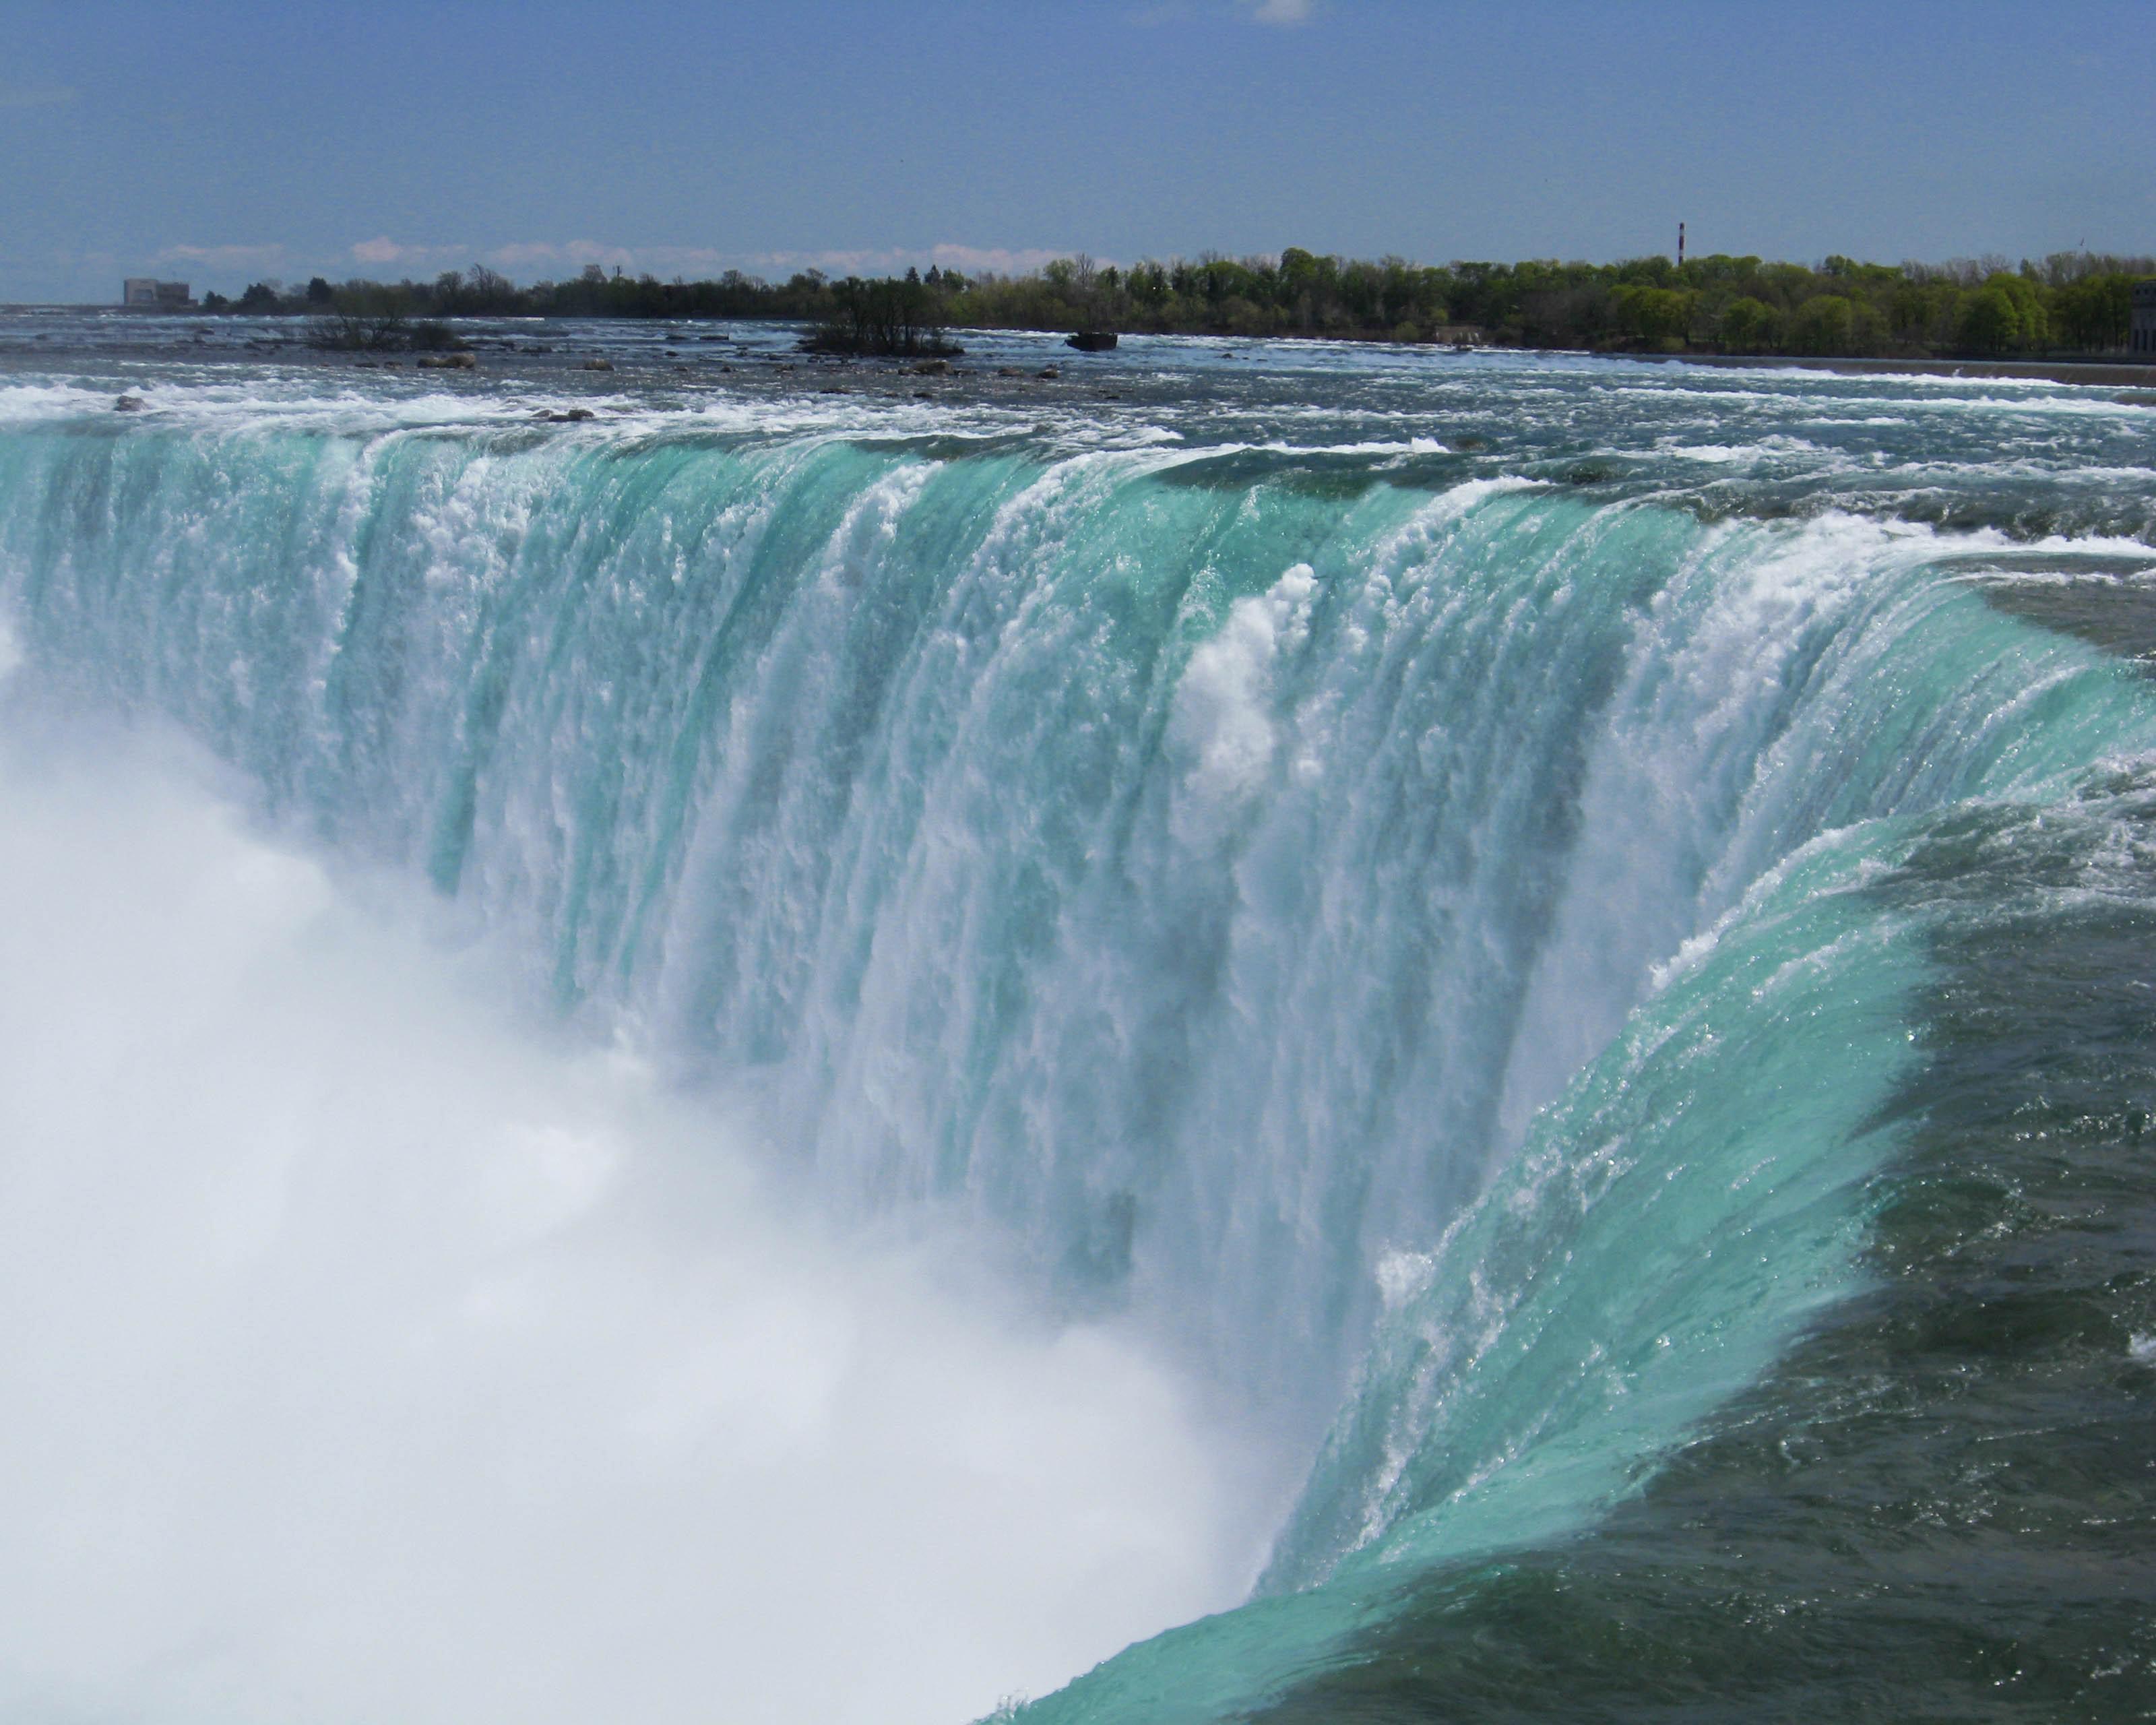 Numa Falls Canada Wallpaper Hd Amazing Landscape View Of Niagara Falls In Ny United